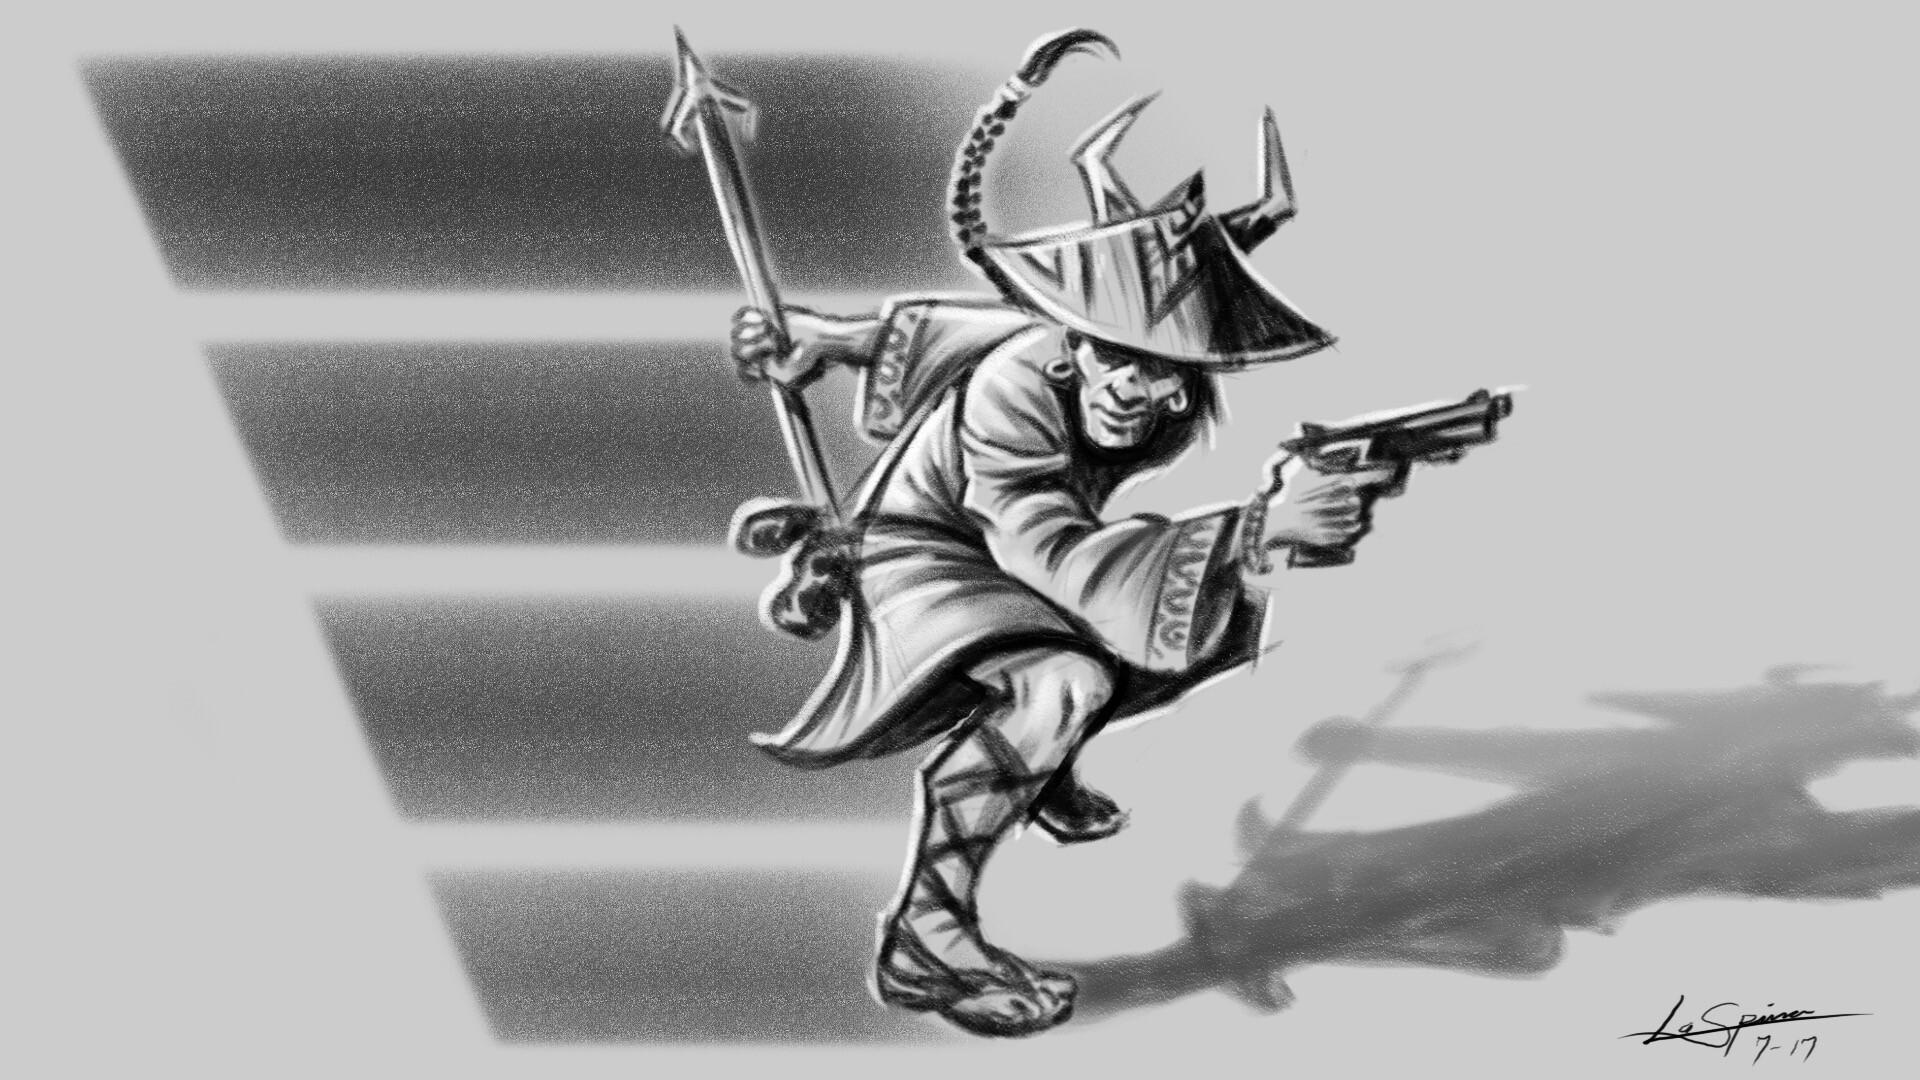 Lance laspina samuraiguntoter